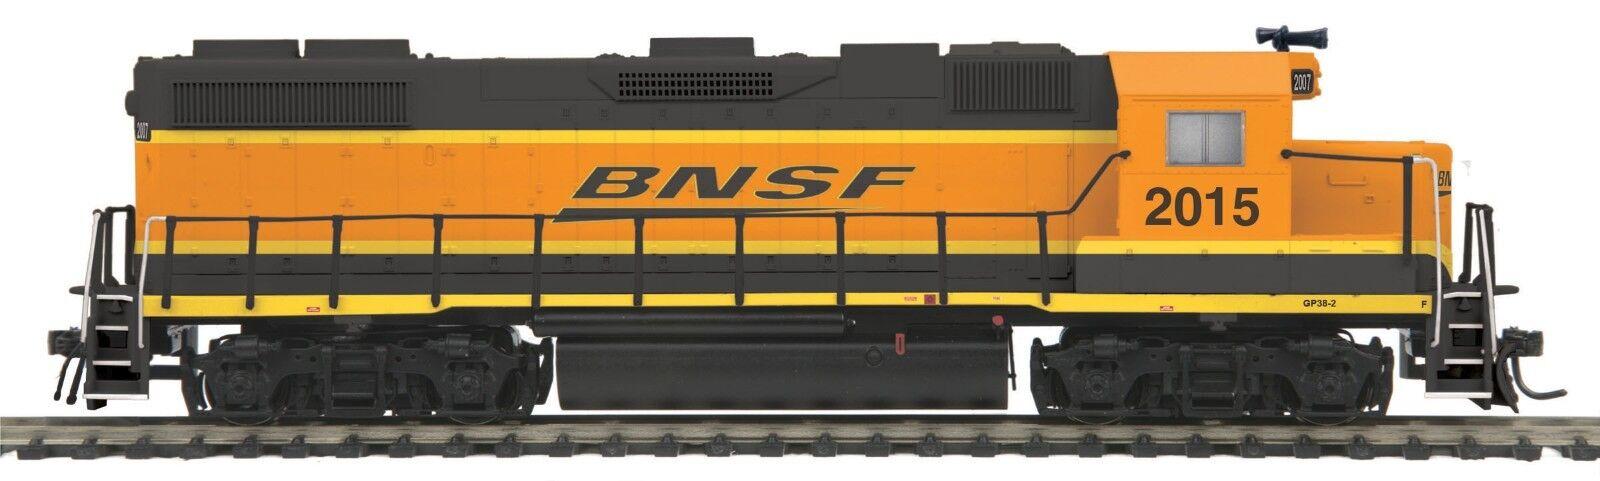 MTH HO 85-2017-0 BNSF GP38-2 DC,DCC READY ROAD NO. 2015